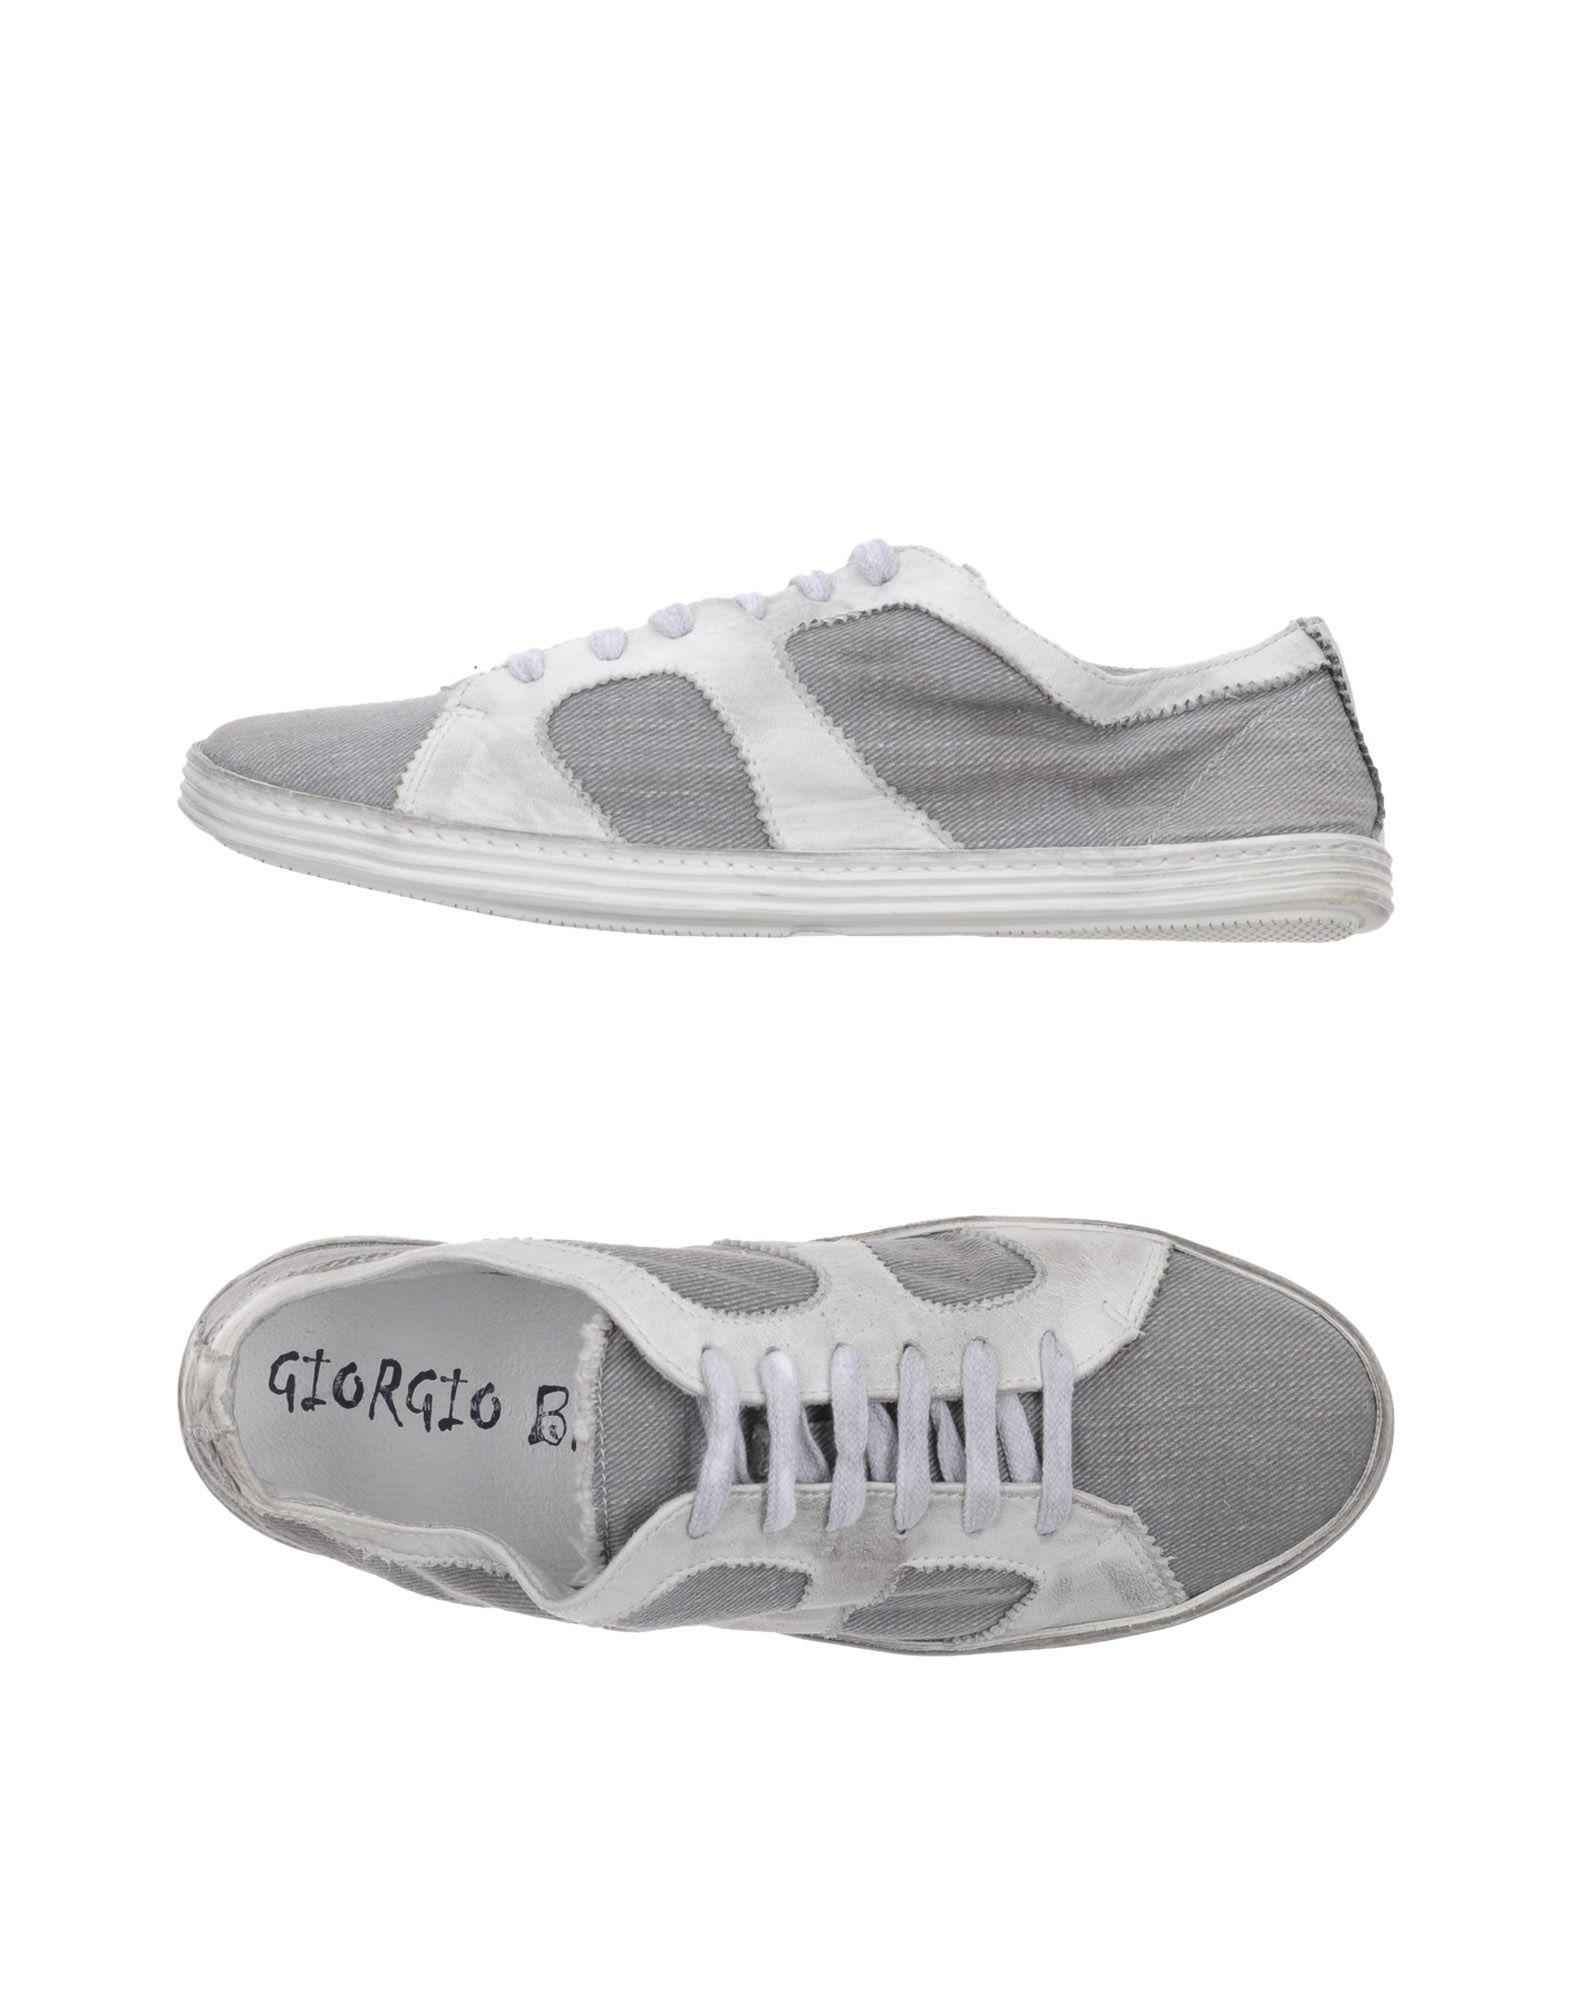 Giorgio Brato Sneakers Damen  11358650AR Gute Qualität beliebte Schuhe